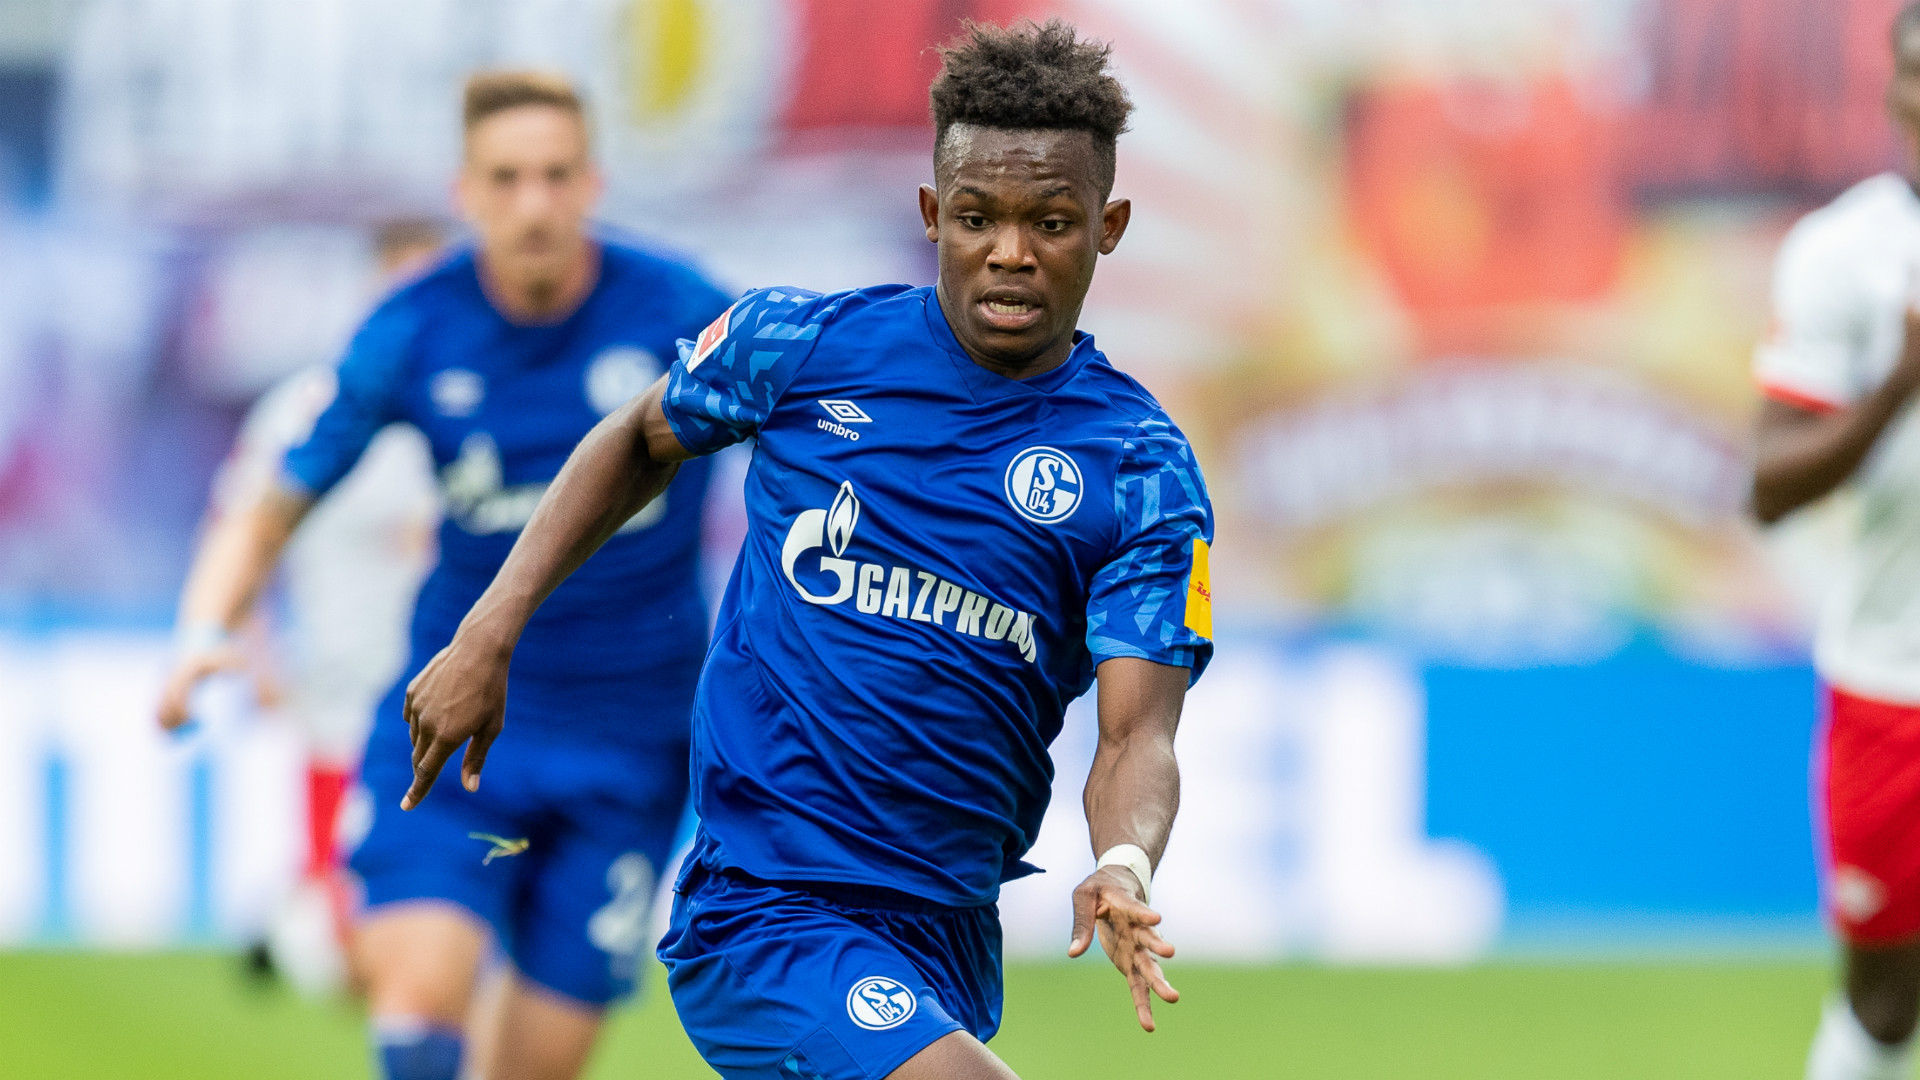 'I just want to do well at Schalke' - Matondo ignoring Manchester United rumours